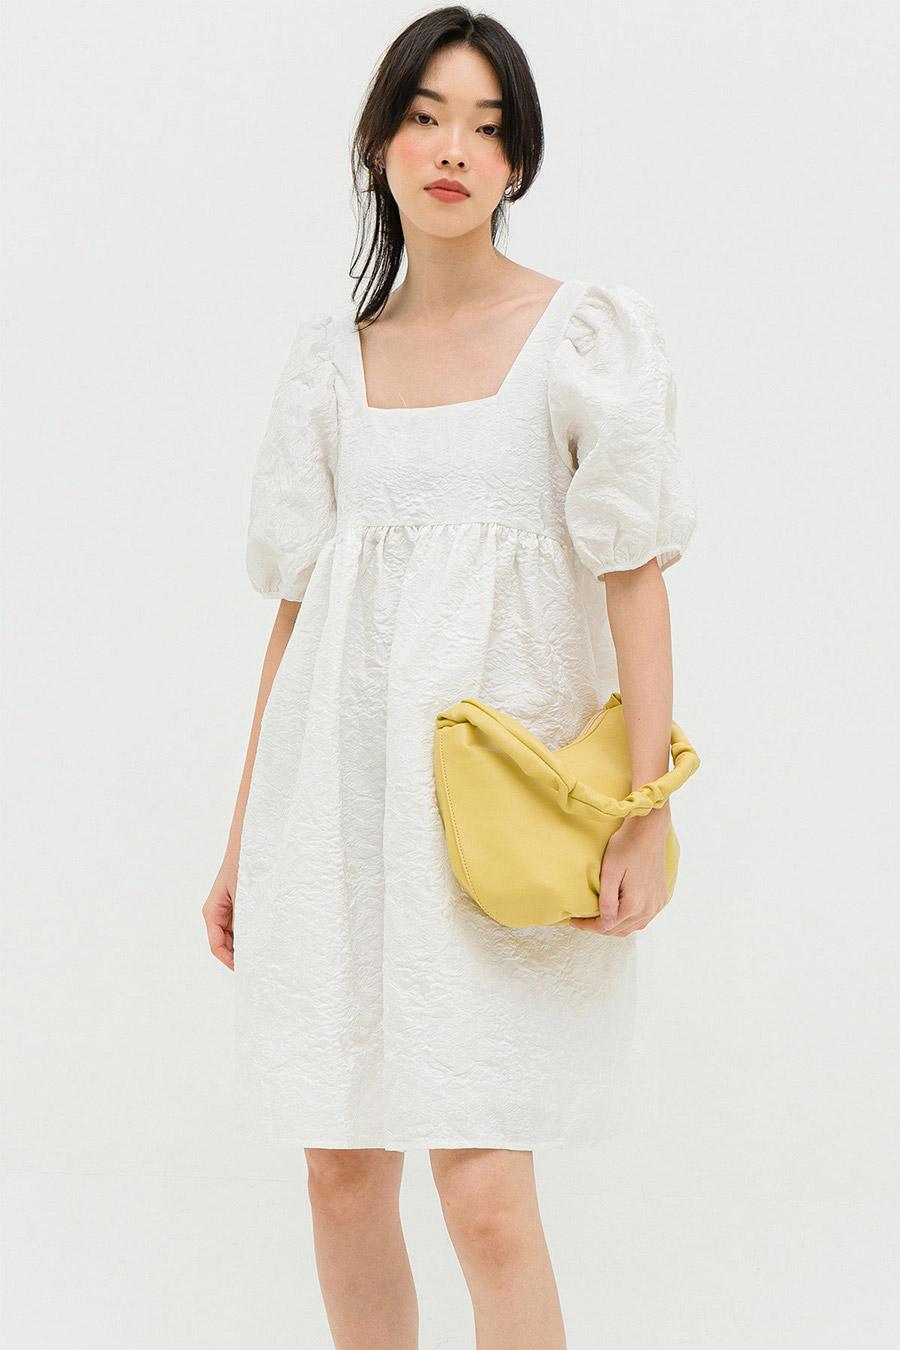 DELAFROSE DRESS - IVORY